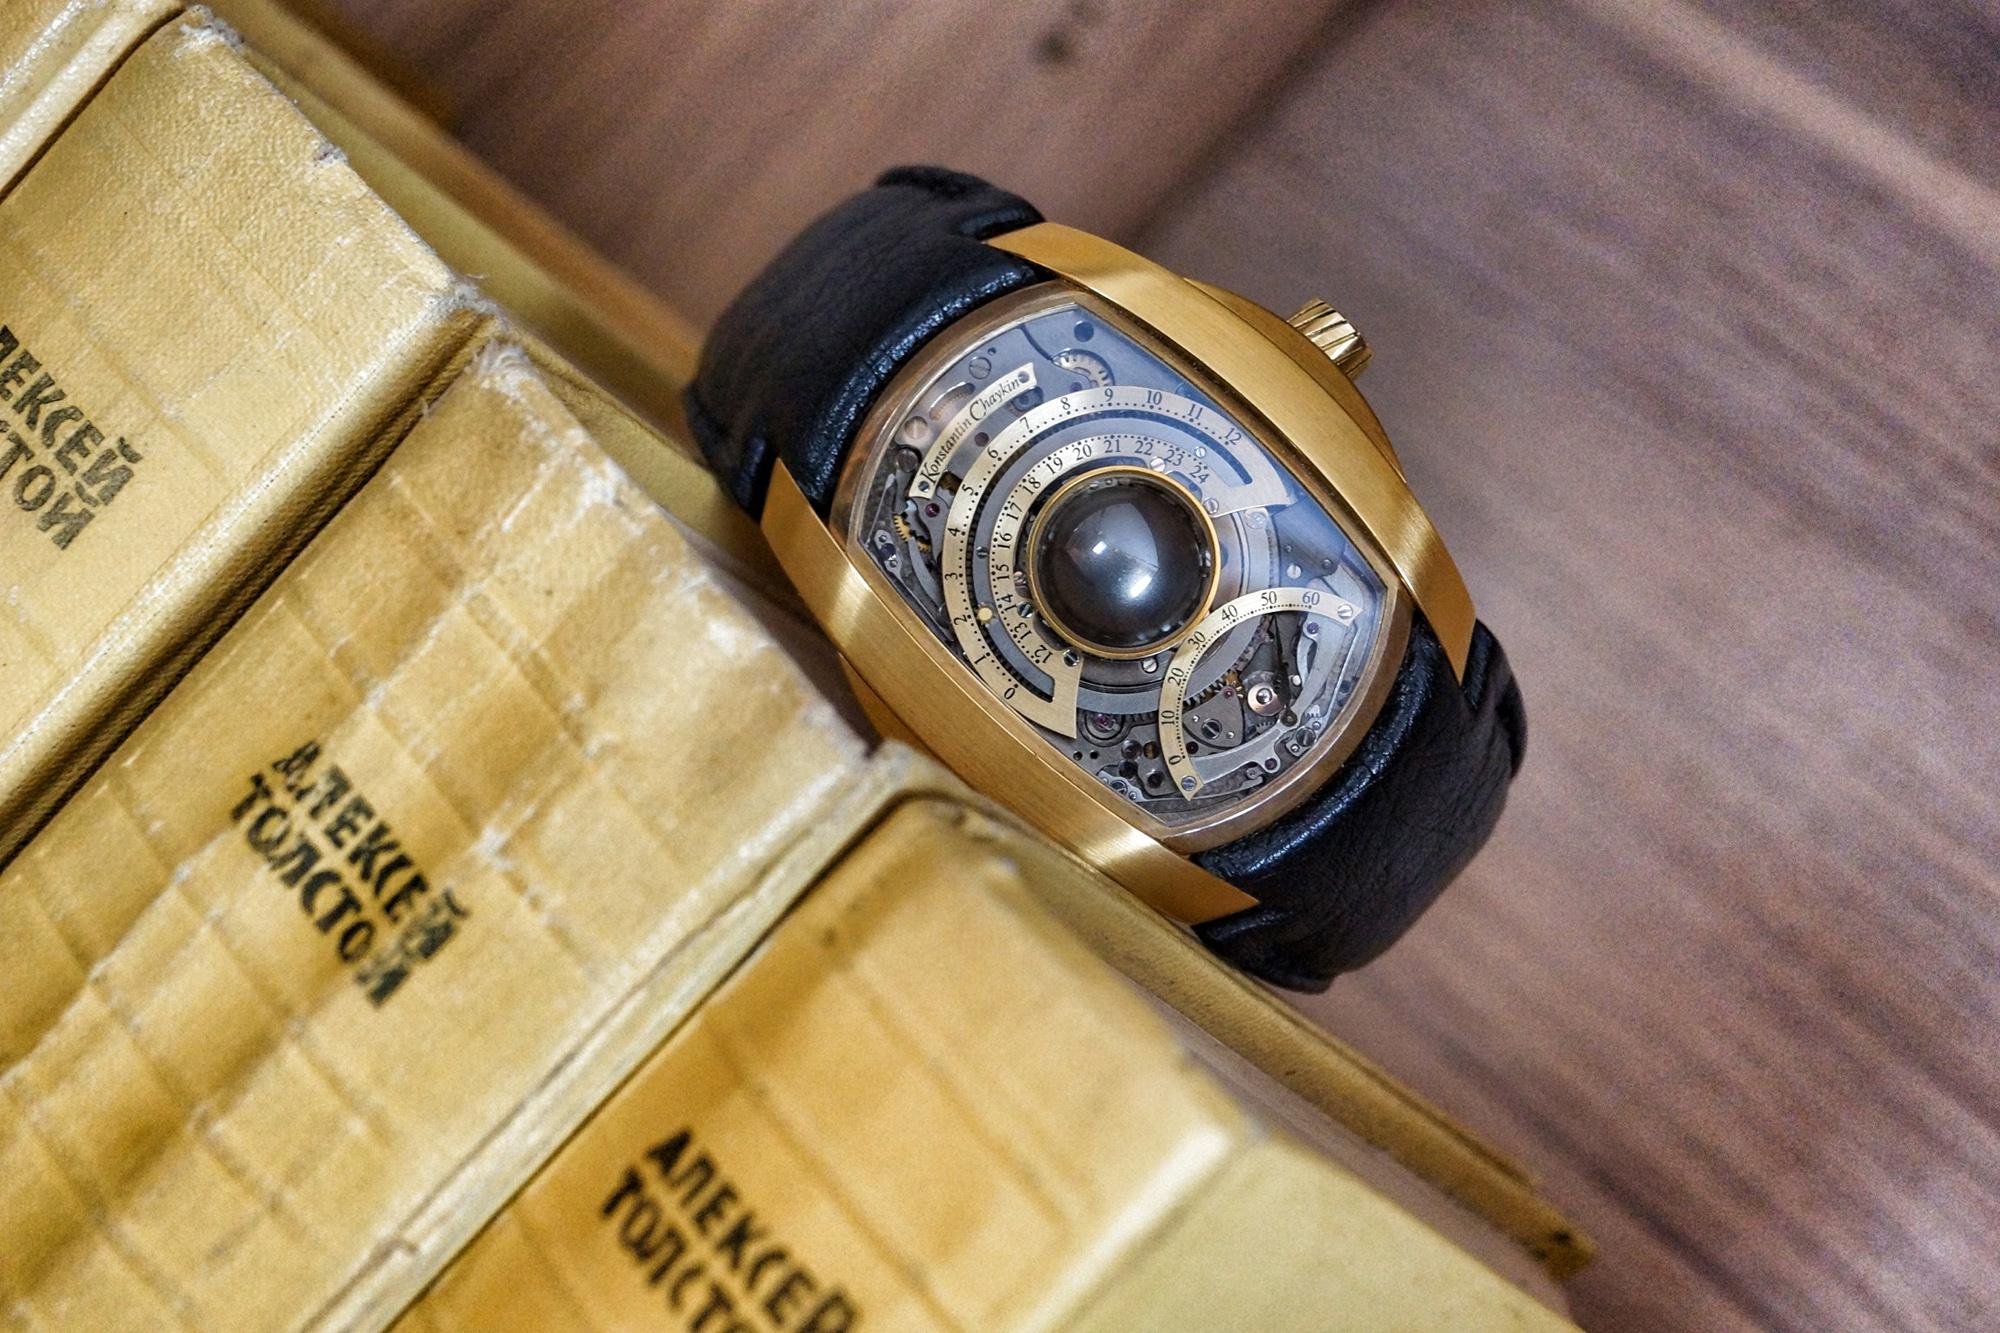 Konstantin Chaykin - Lunokhod Watch